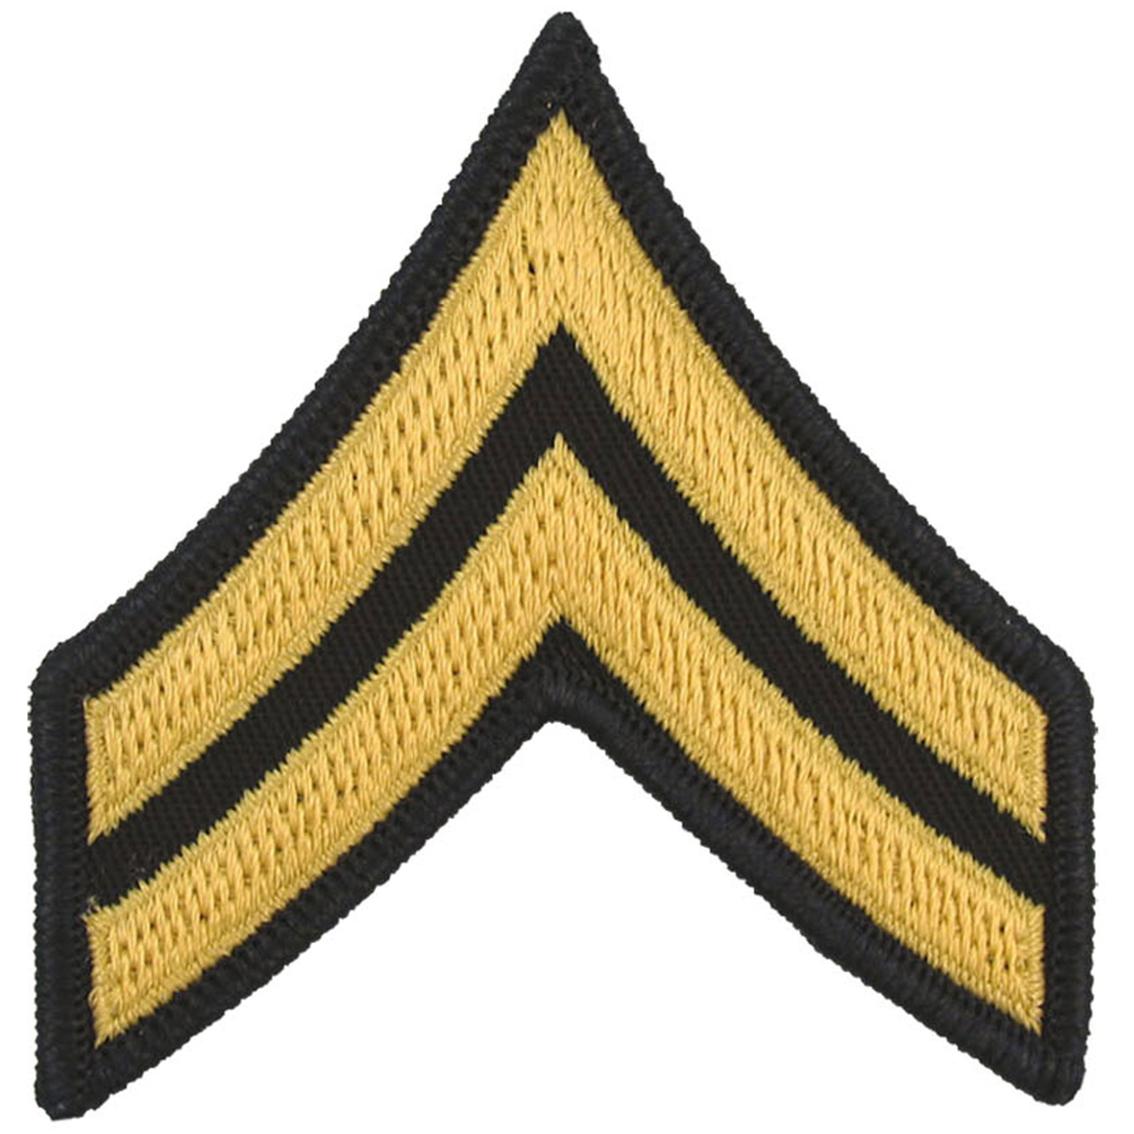 Army Rank Cpl Large Asu Sew-on | Large Asu Rank | Military | Shop ...